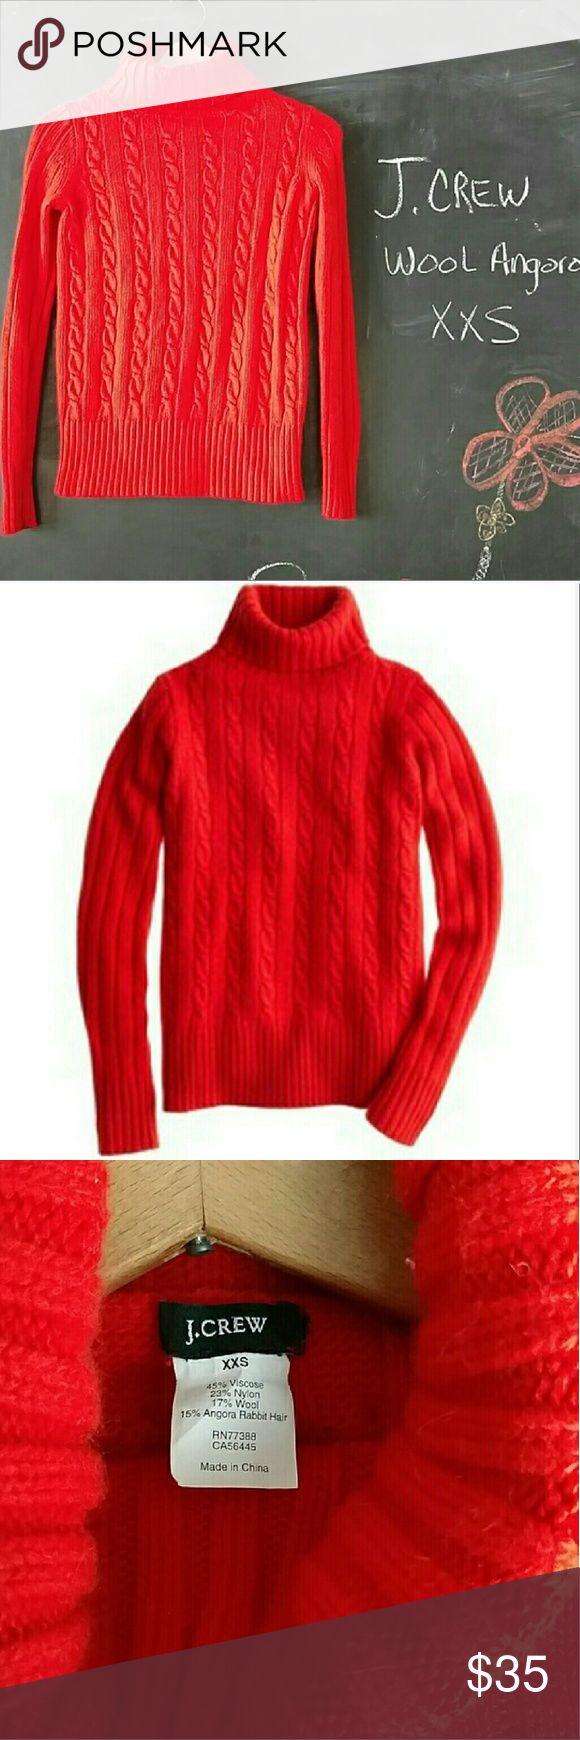 J. Crew Cambridge Cable Knit Orange Sweater XS J. Crew Cambridge Cable Knit Orange Turtleneck Sweater.  Sz XXS (fits size 0-2 women's)  Wool Angora nylon viscose blend.  Bright Orange!!!!  (Like construction orange bright!)  Turtle neck, thick sweater.  Bust 30-32 Sleeve length 22 in Sweater length 22.5  Very nice sweater in excellent condition.  No stains or wear.  Smoke and Pet free environment. J. Crew Sweaters Cowl & Turtlenecks